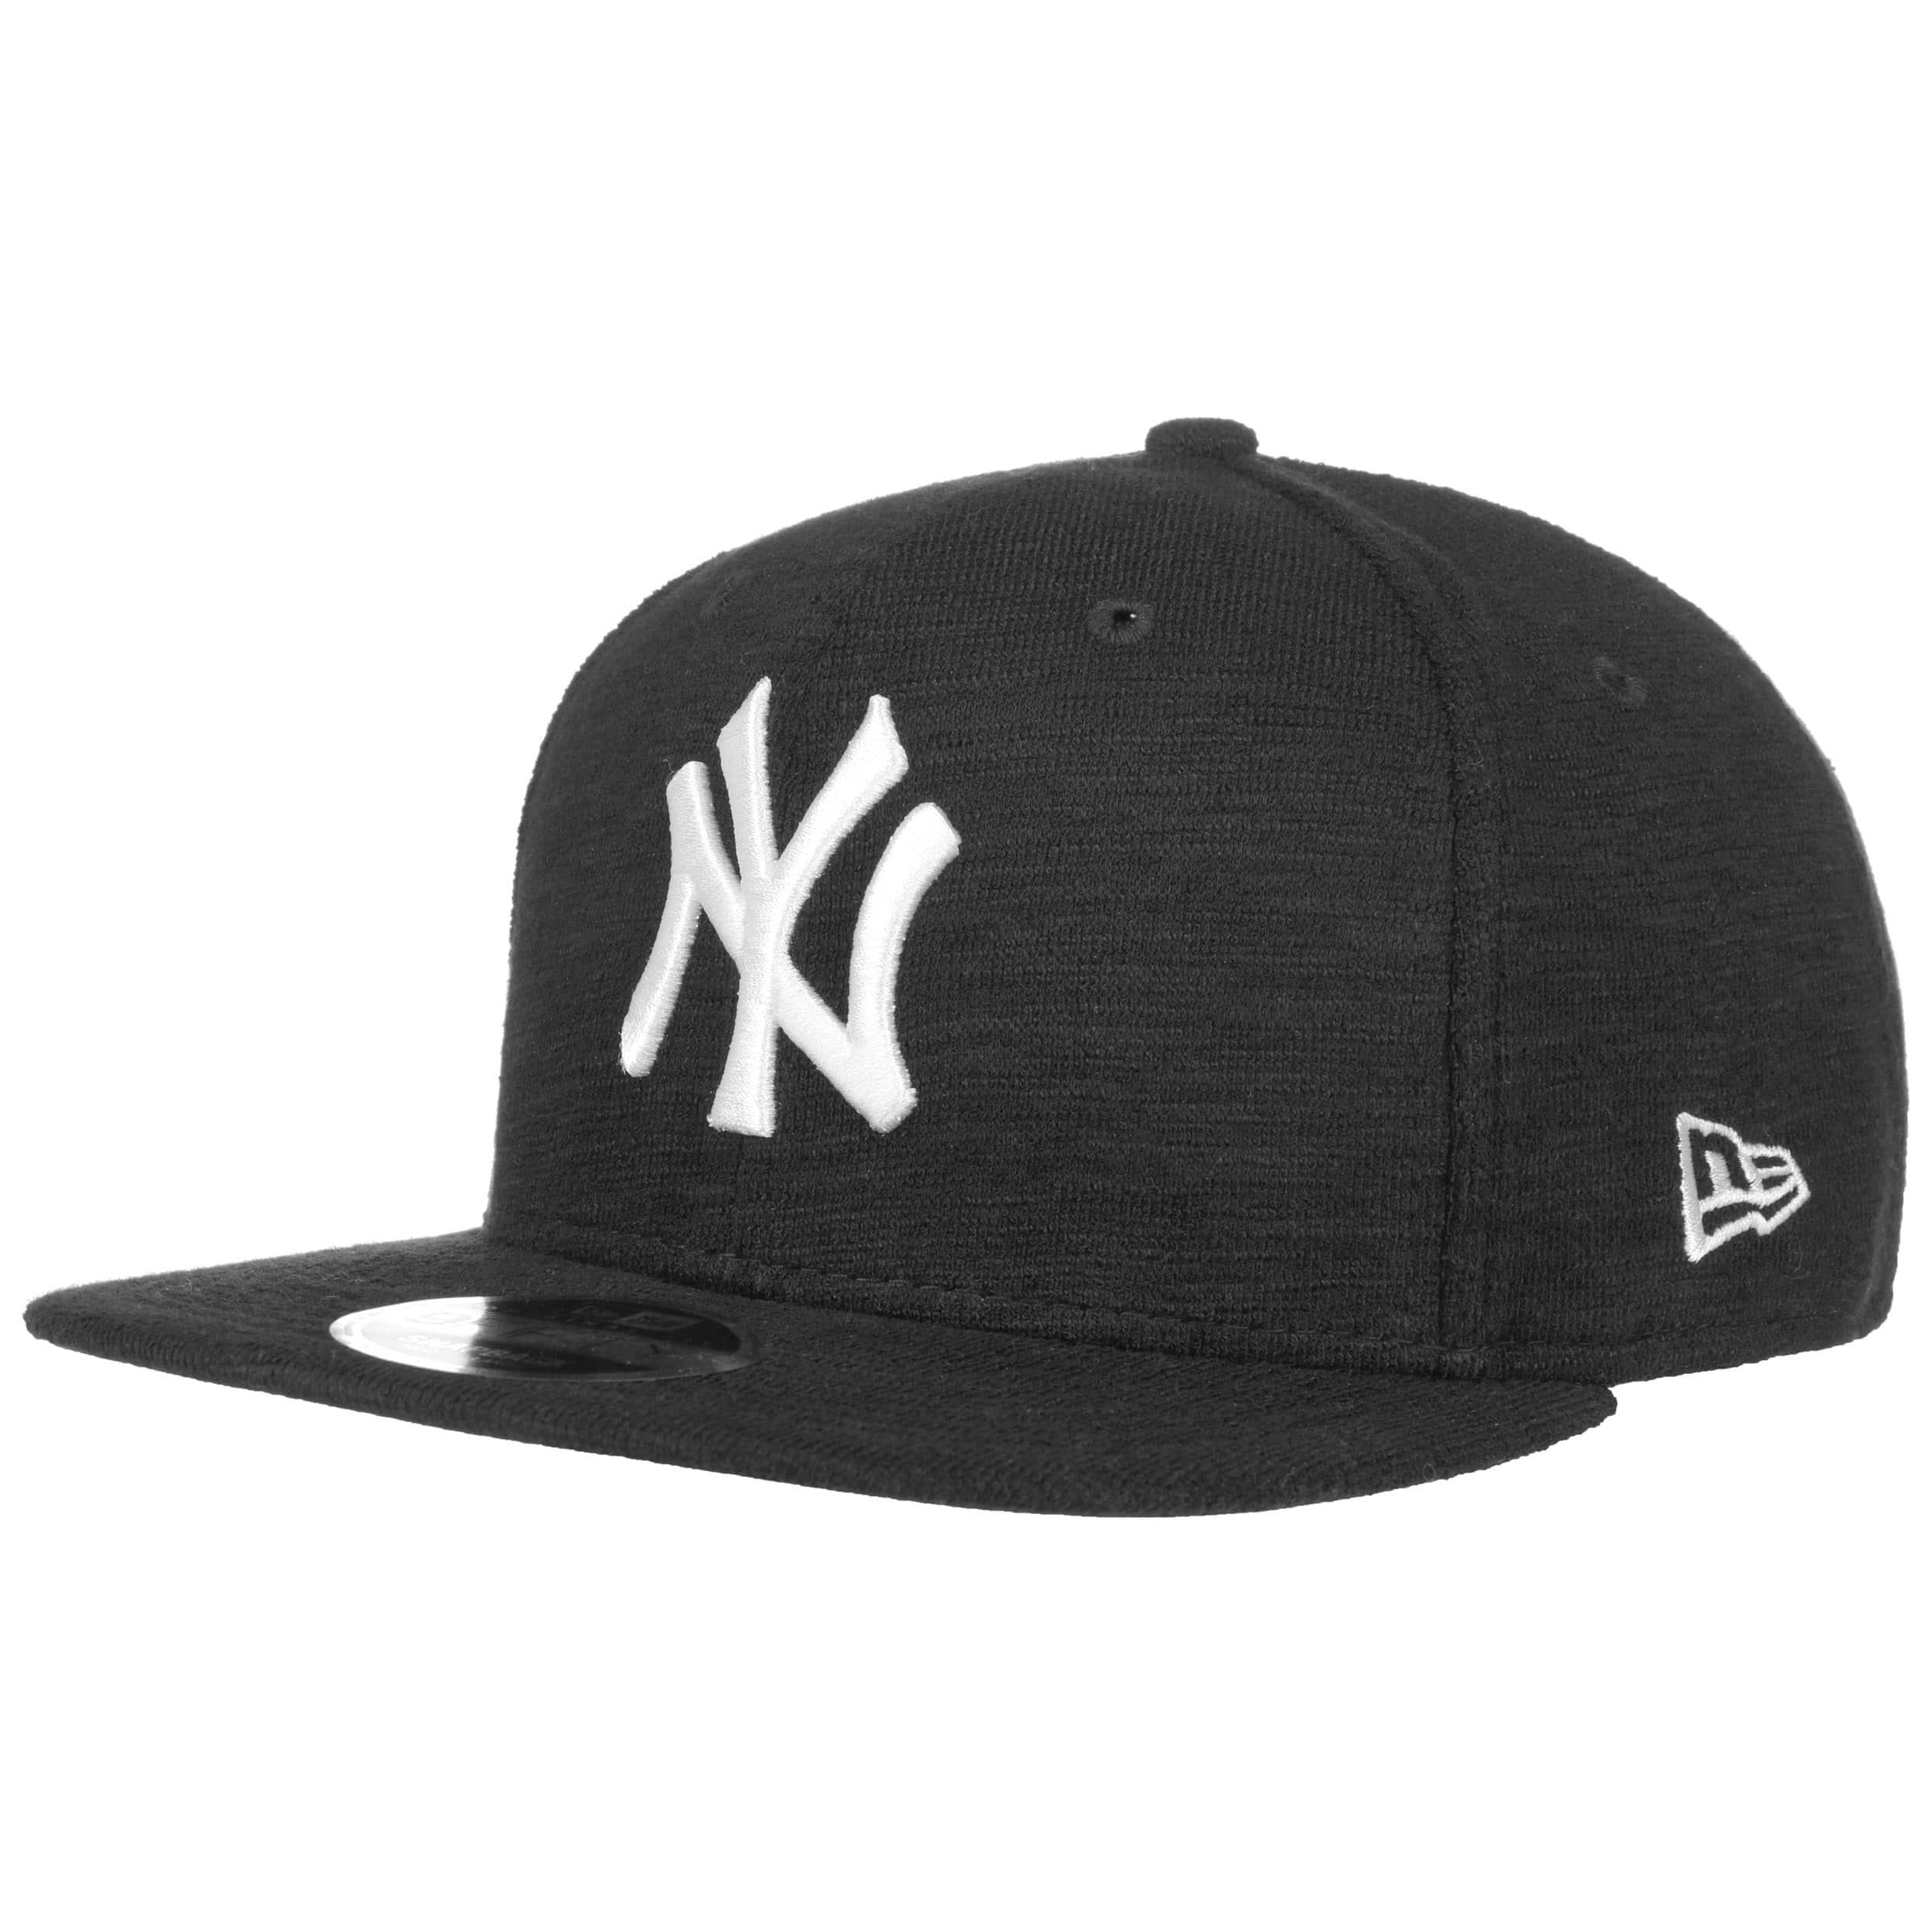 9fifty slub yankees cap by new era eur 3695 hats caps 9fifty slub yankees cap by new era 5 biocorpaavc